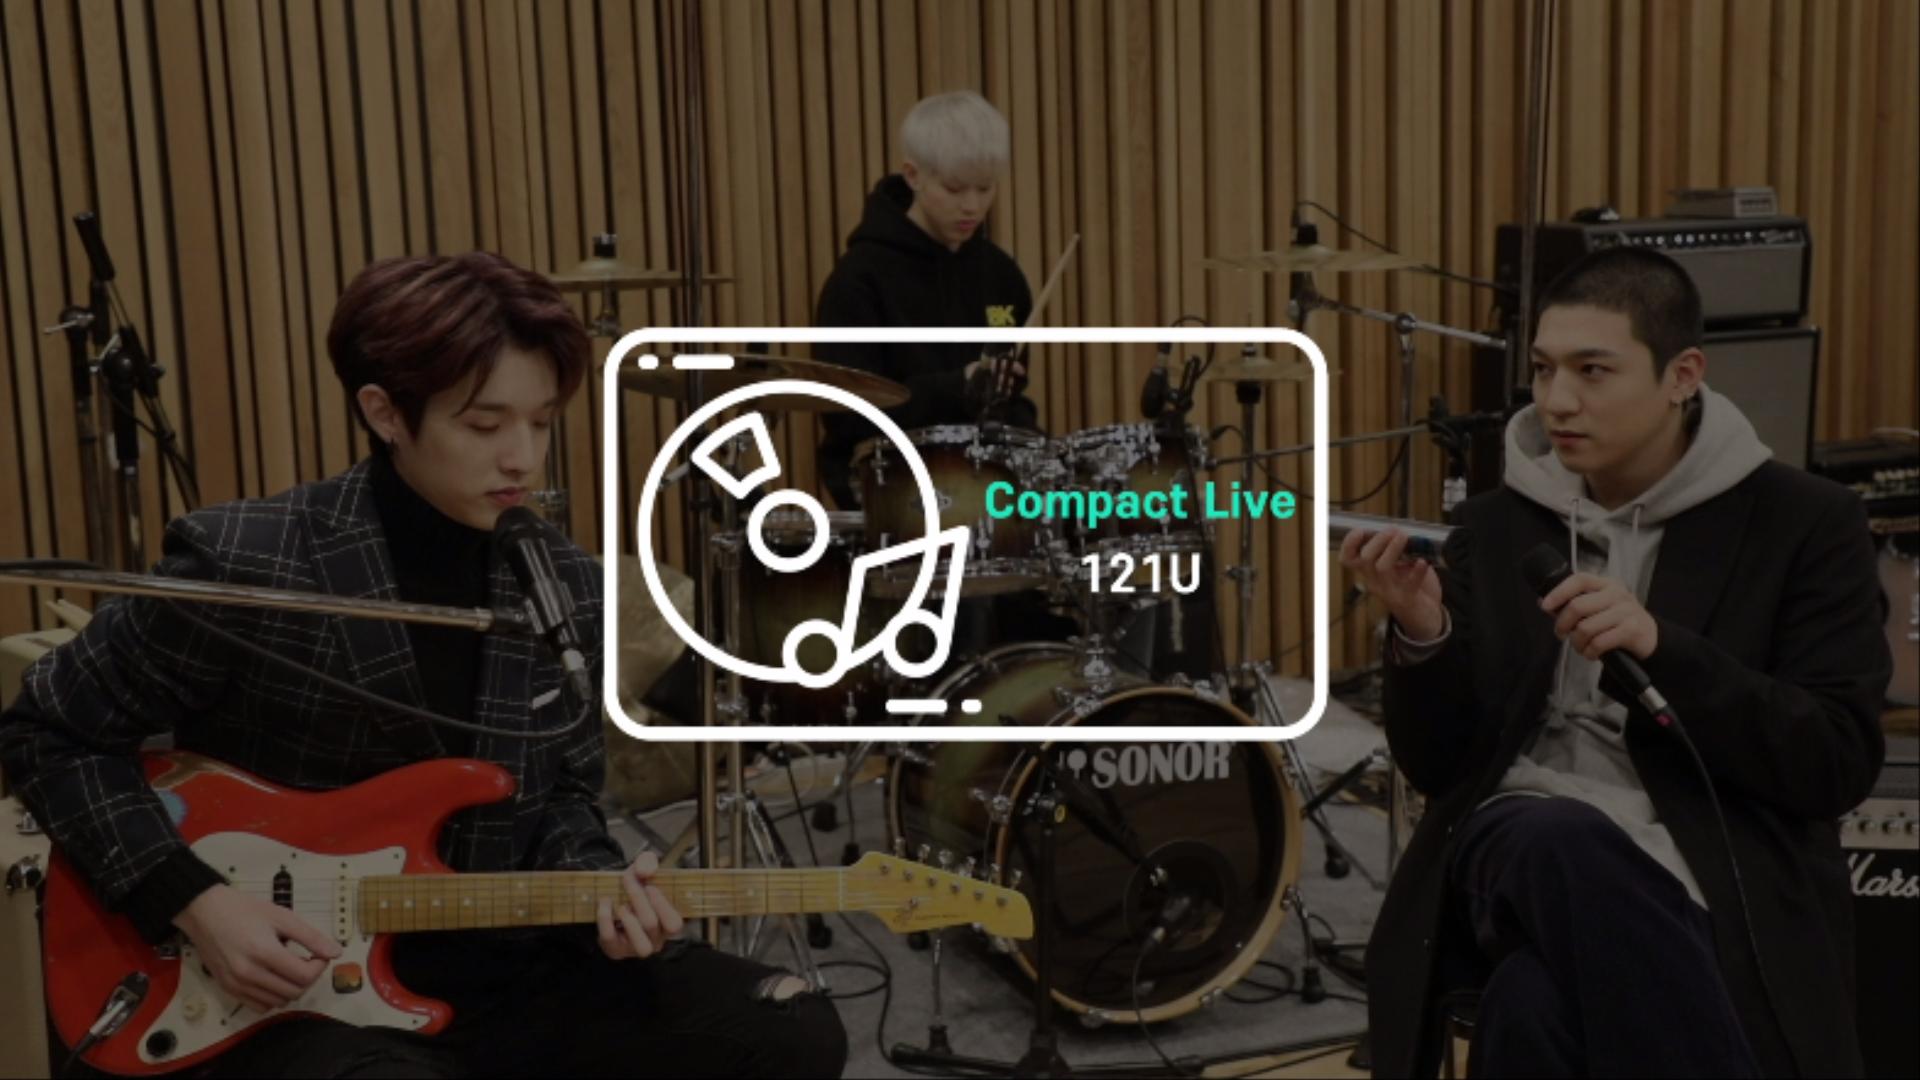 "[Compact Live] Take #3 DAY6 ""121U"""